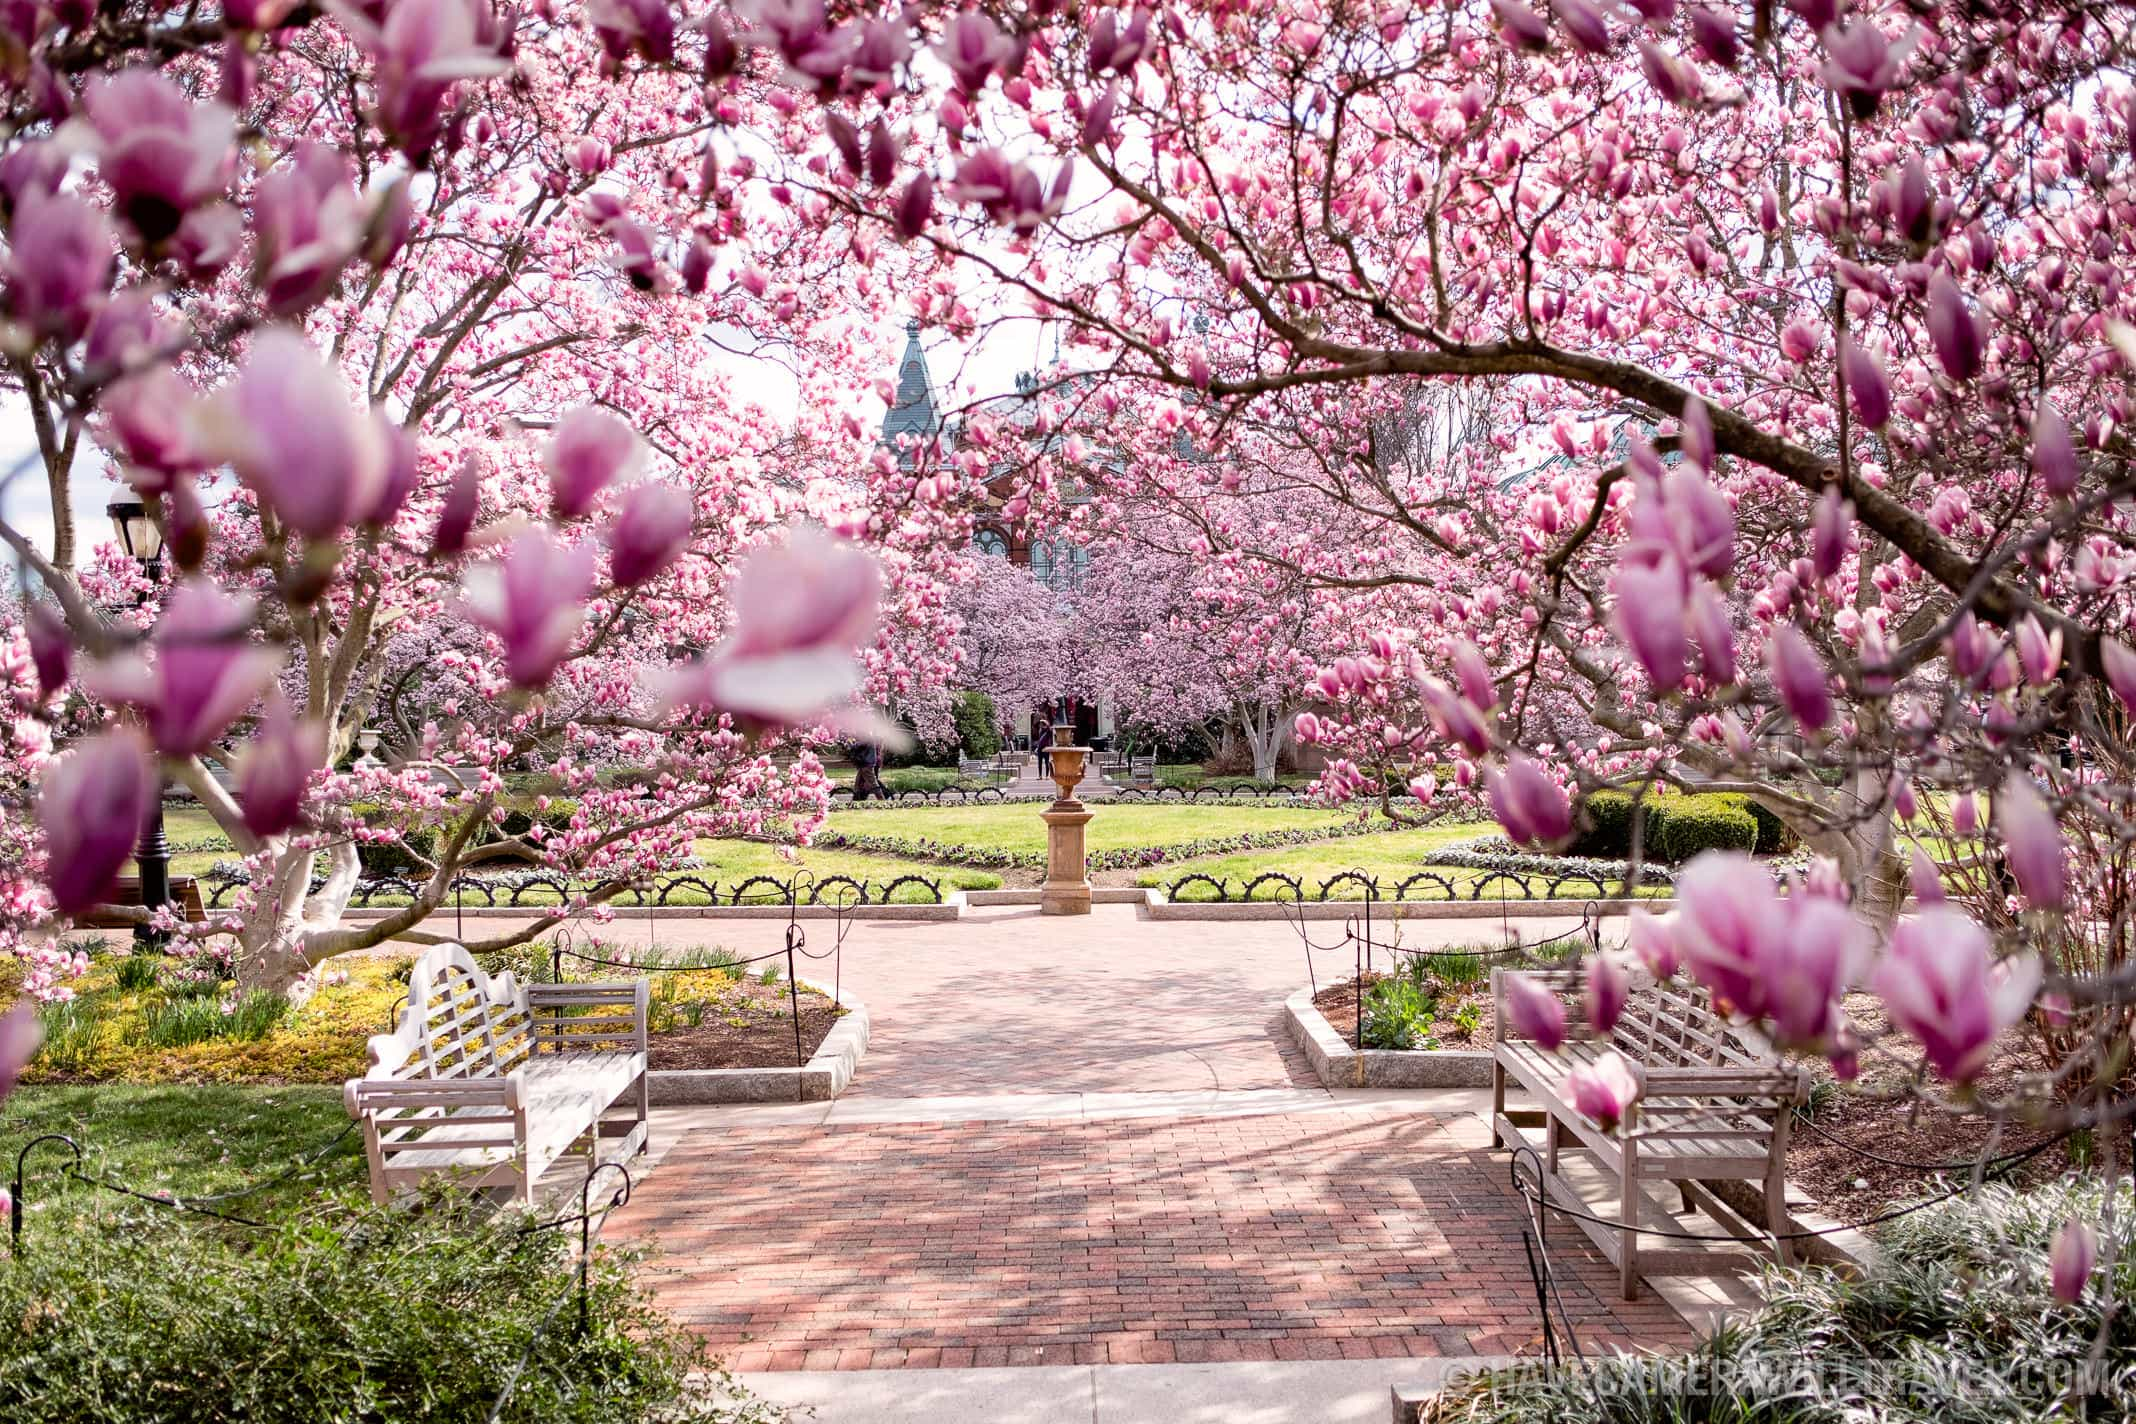 Saucer Magnolias in bloom at the Enid A. Haupt Garden